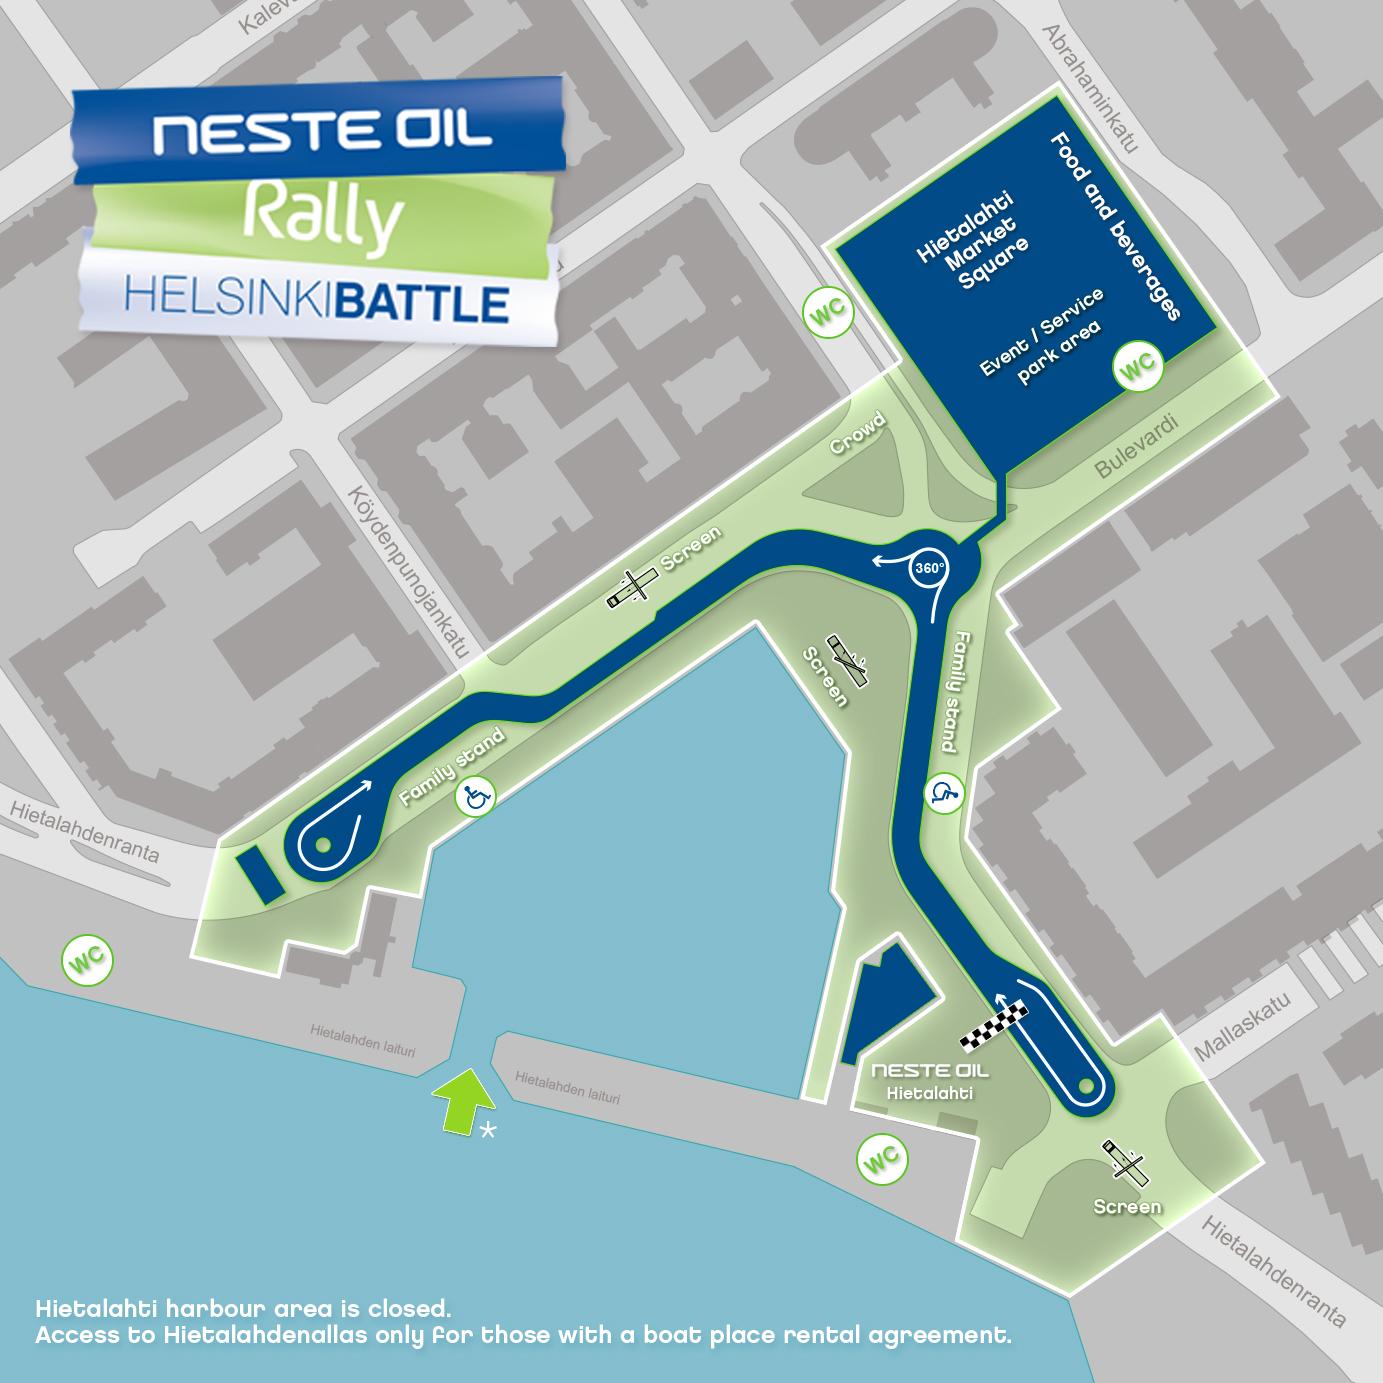 Neste Oil Rally Helsinki Battle